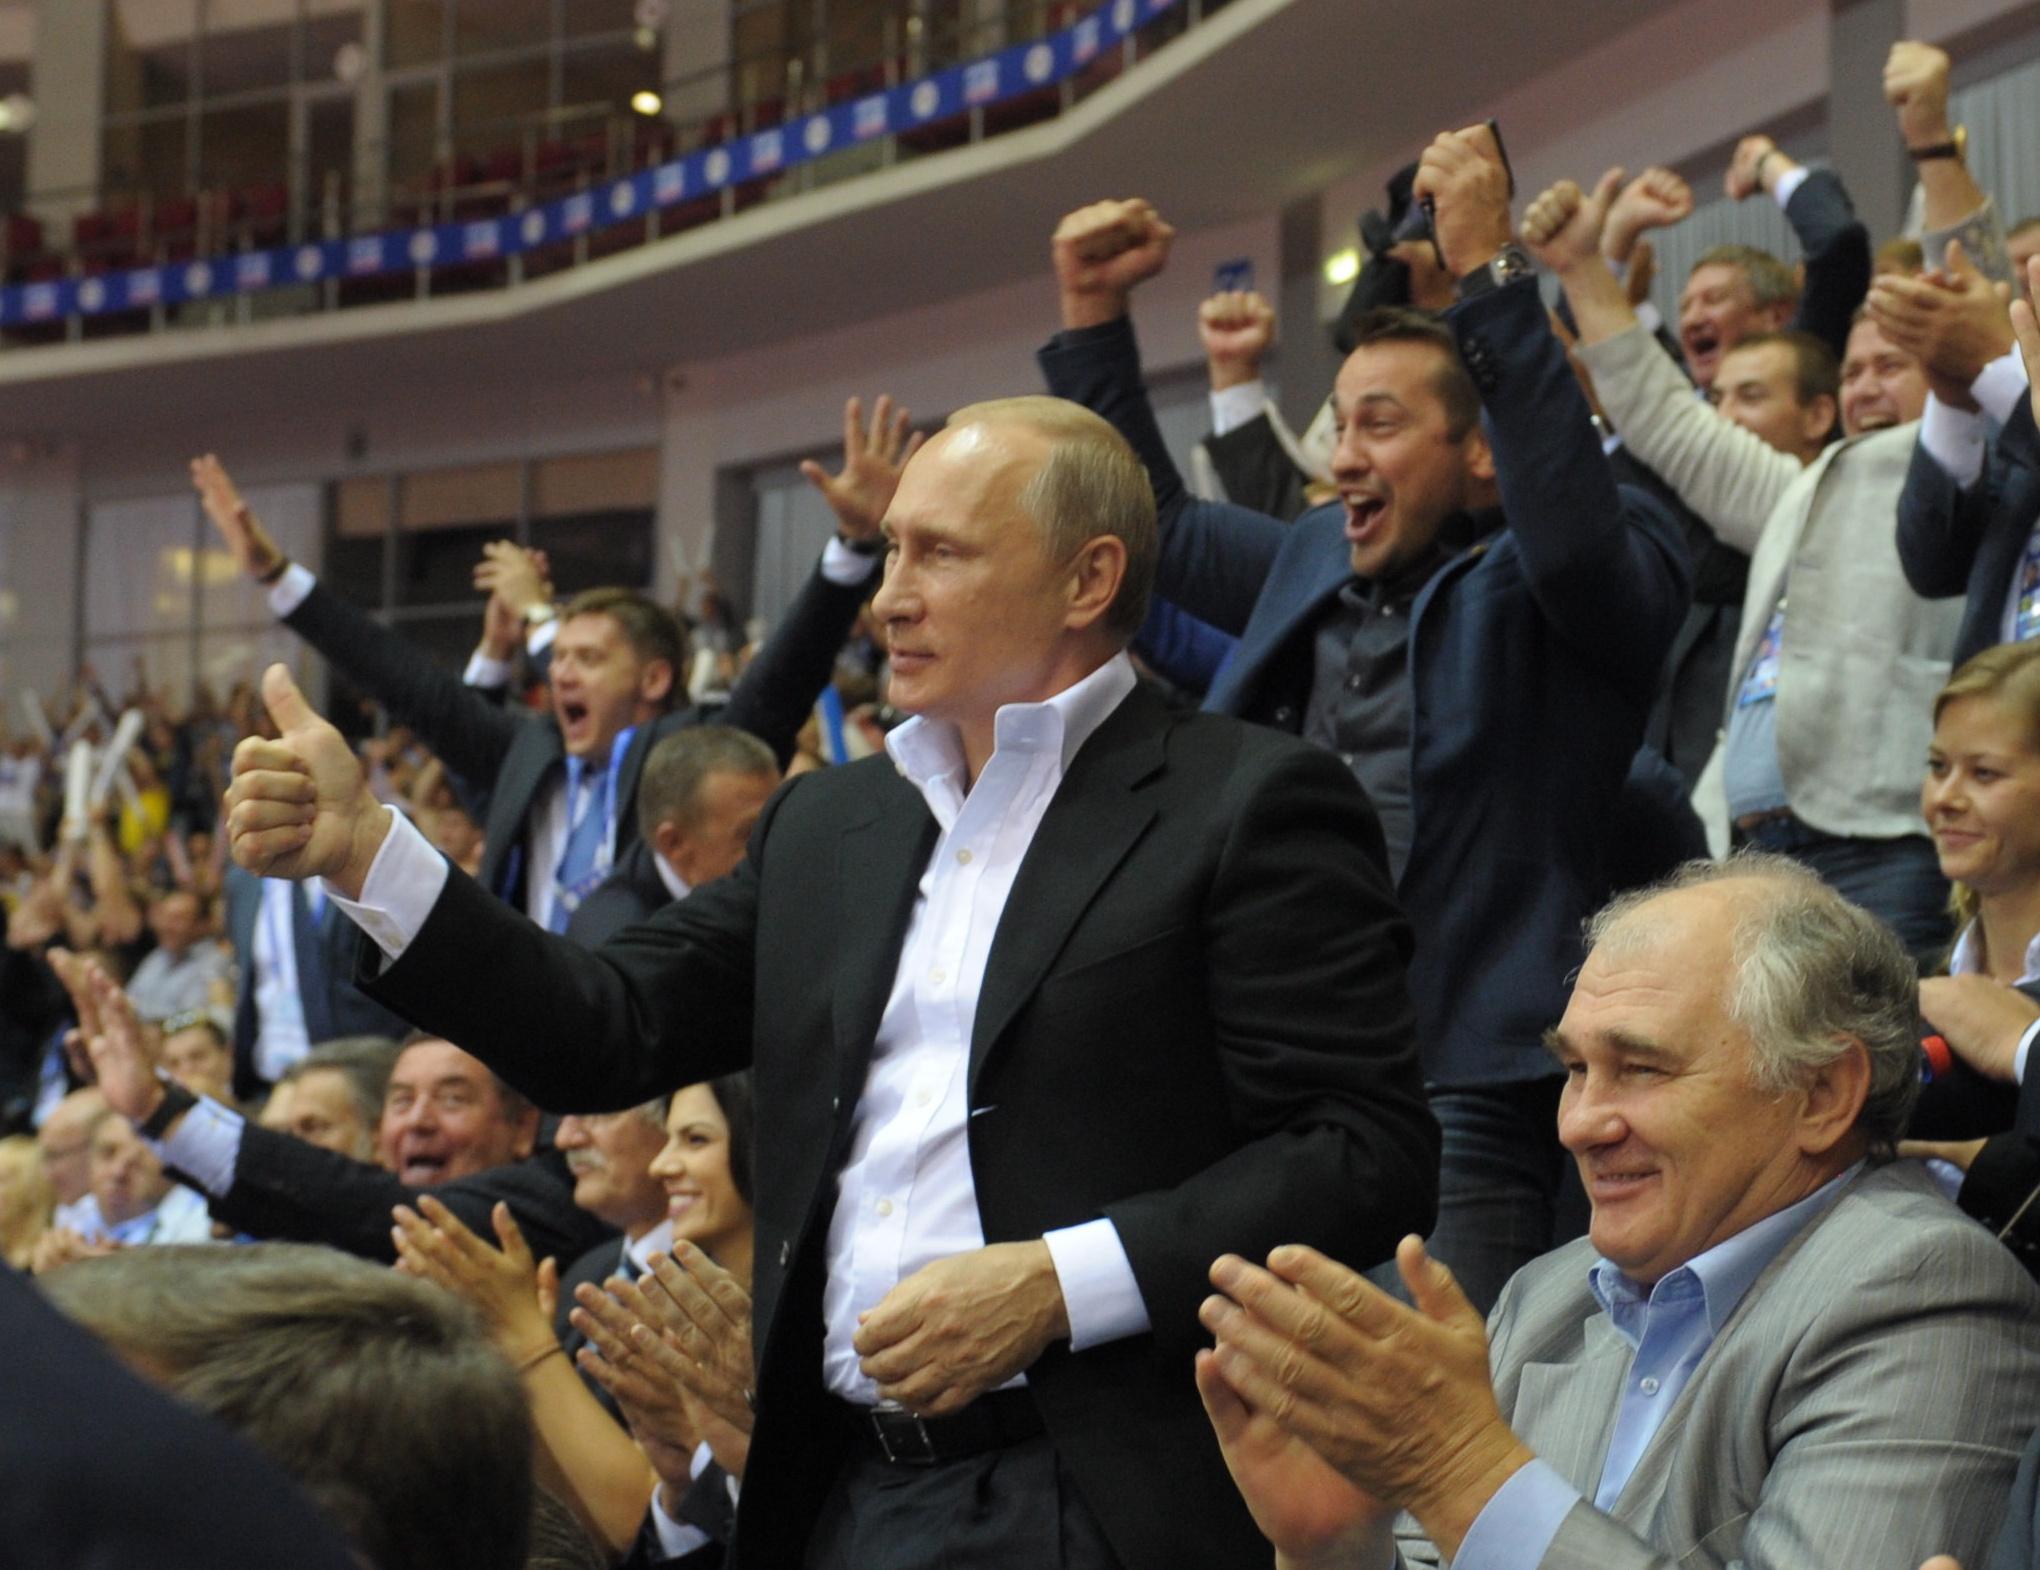 Президент РФ Владимир Путин во время церемонии закрытия чемпионата мира по дзюдо-2014.